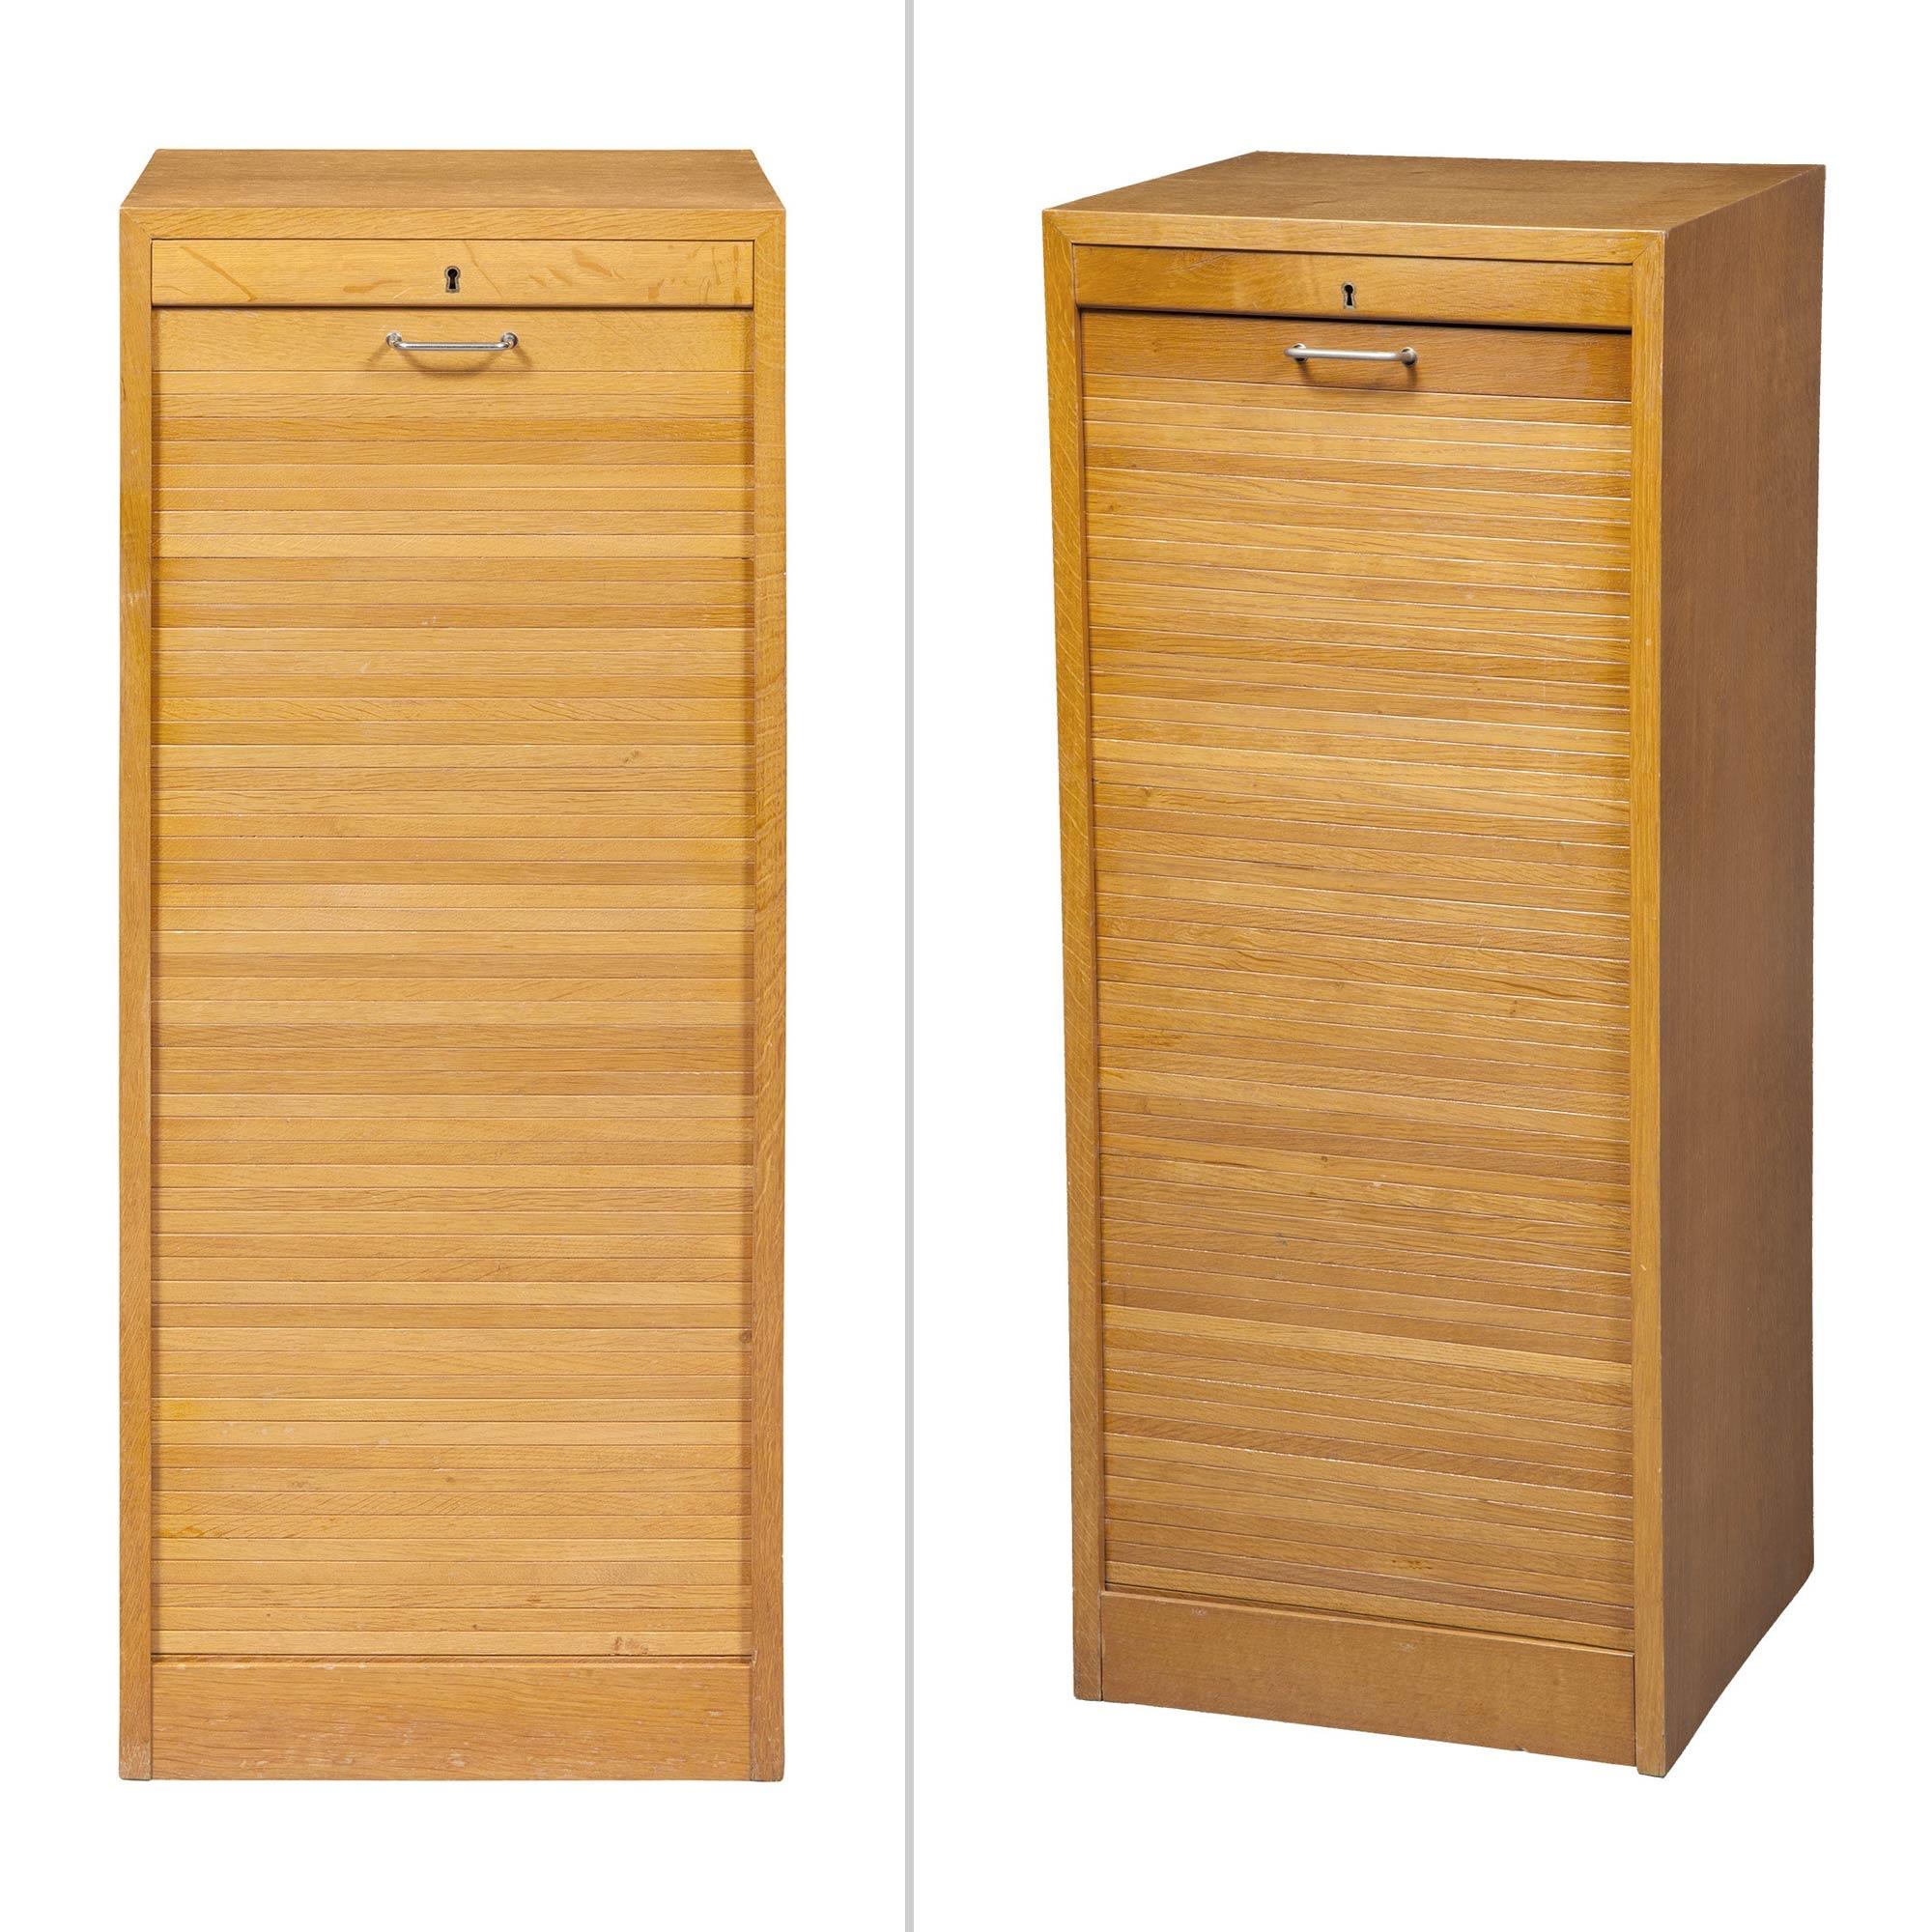 Hans J.Wegner  Pair of Tambour Cabinets  MutualArt